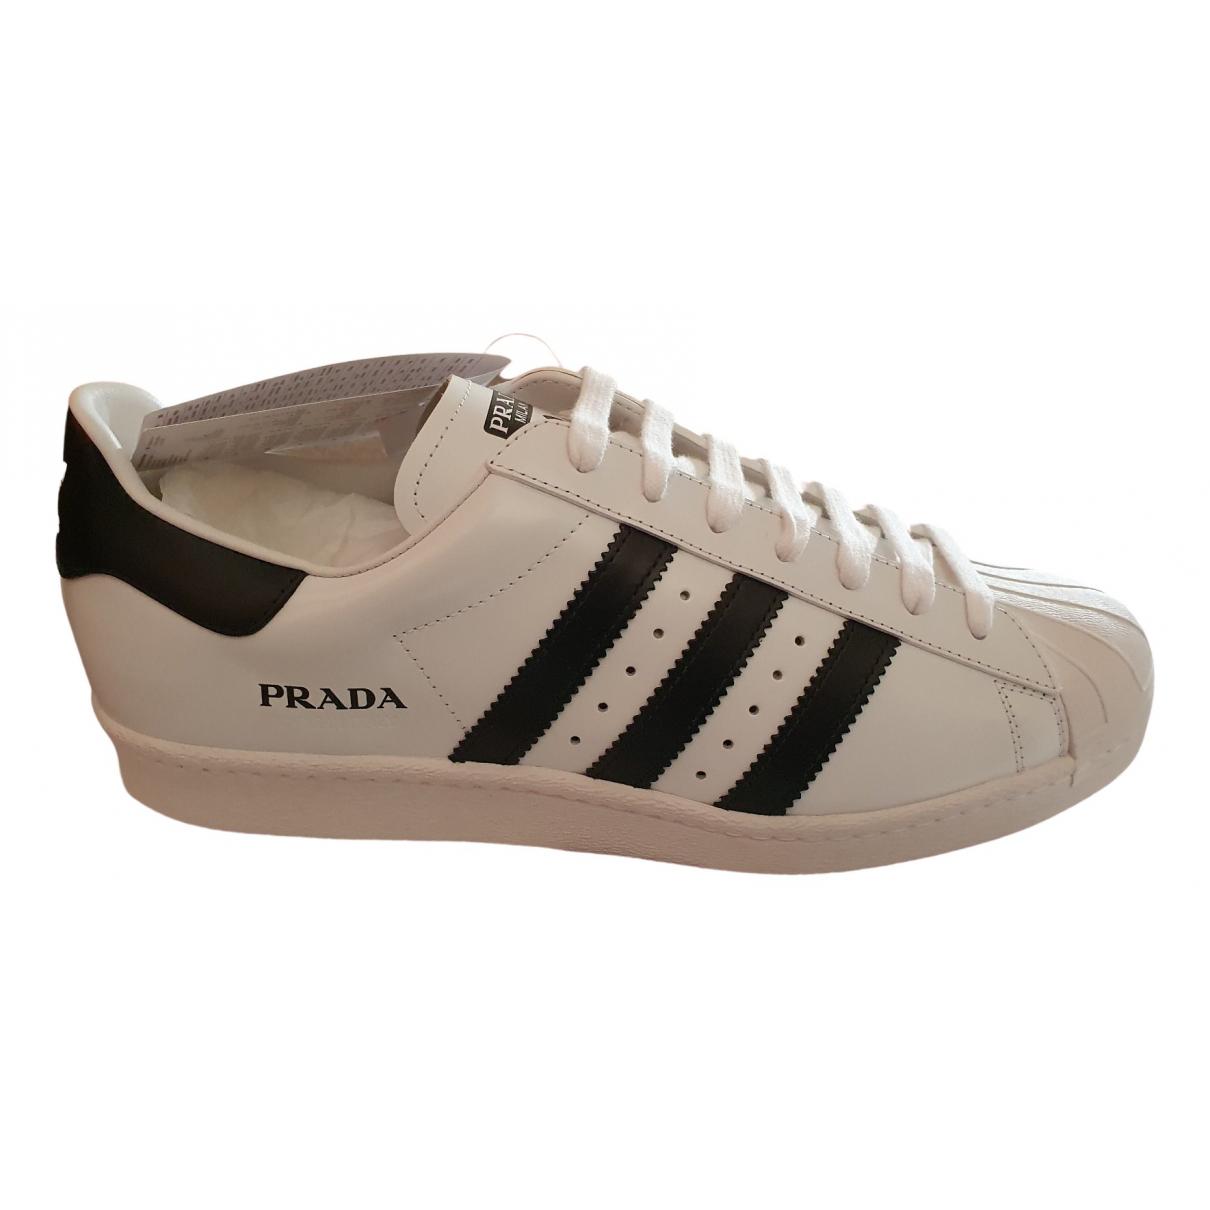 Prada X Adidas - Baskets   pour homme en cuir - blanc